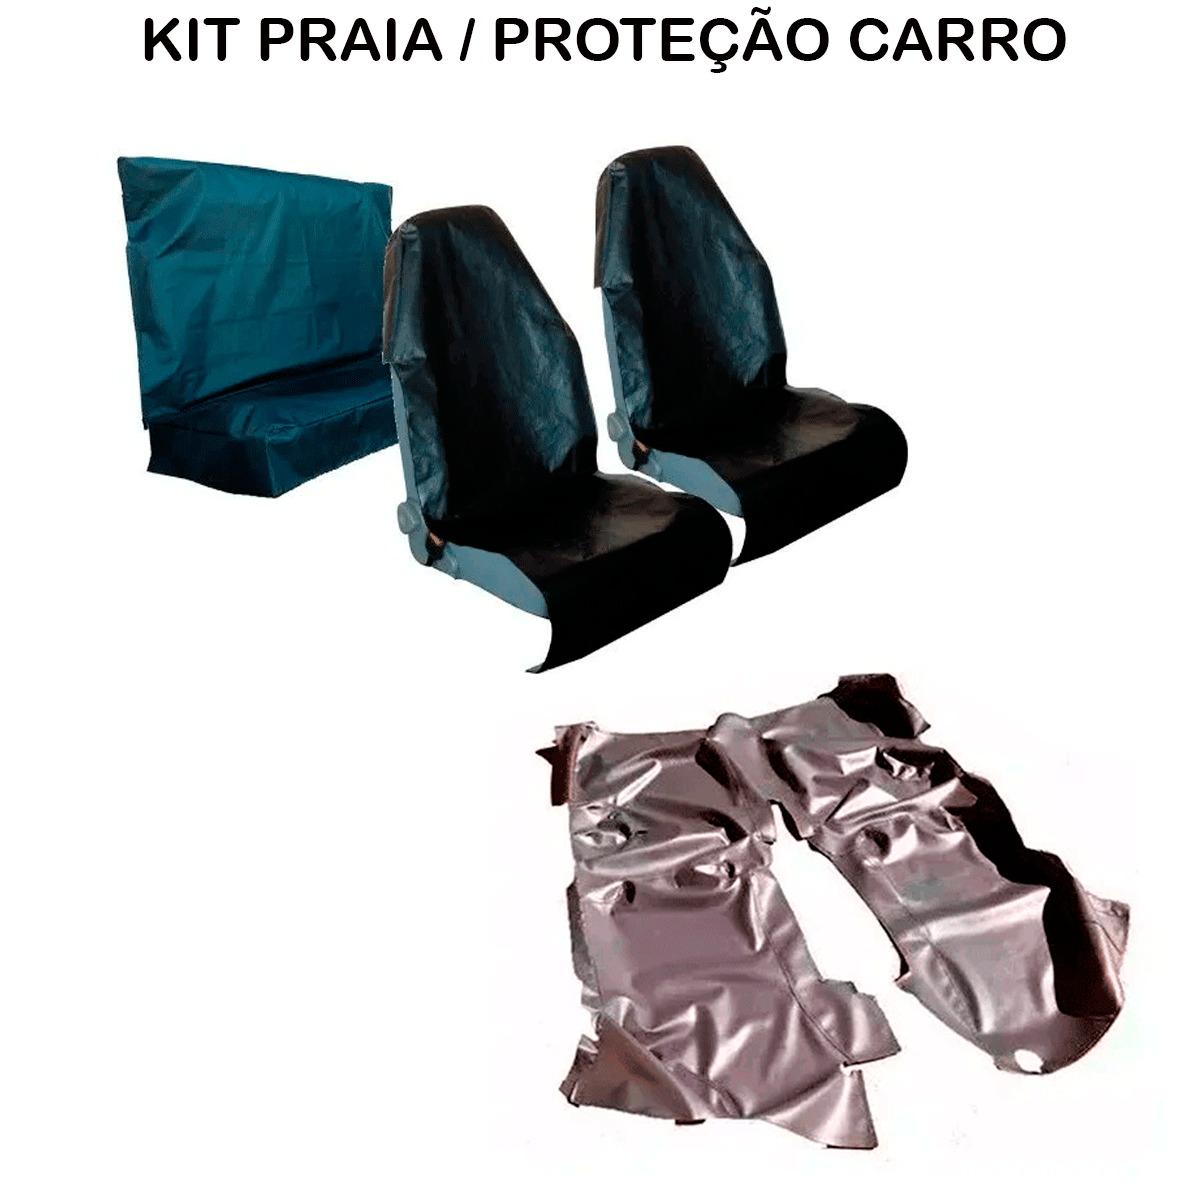 Tapete Em Vinil Volkswagen Up + Capa Banco Protecao Banco Areia Suor Academia